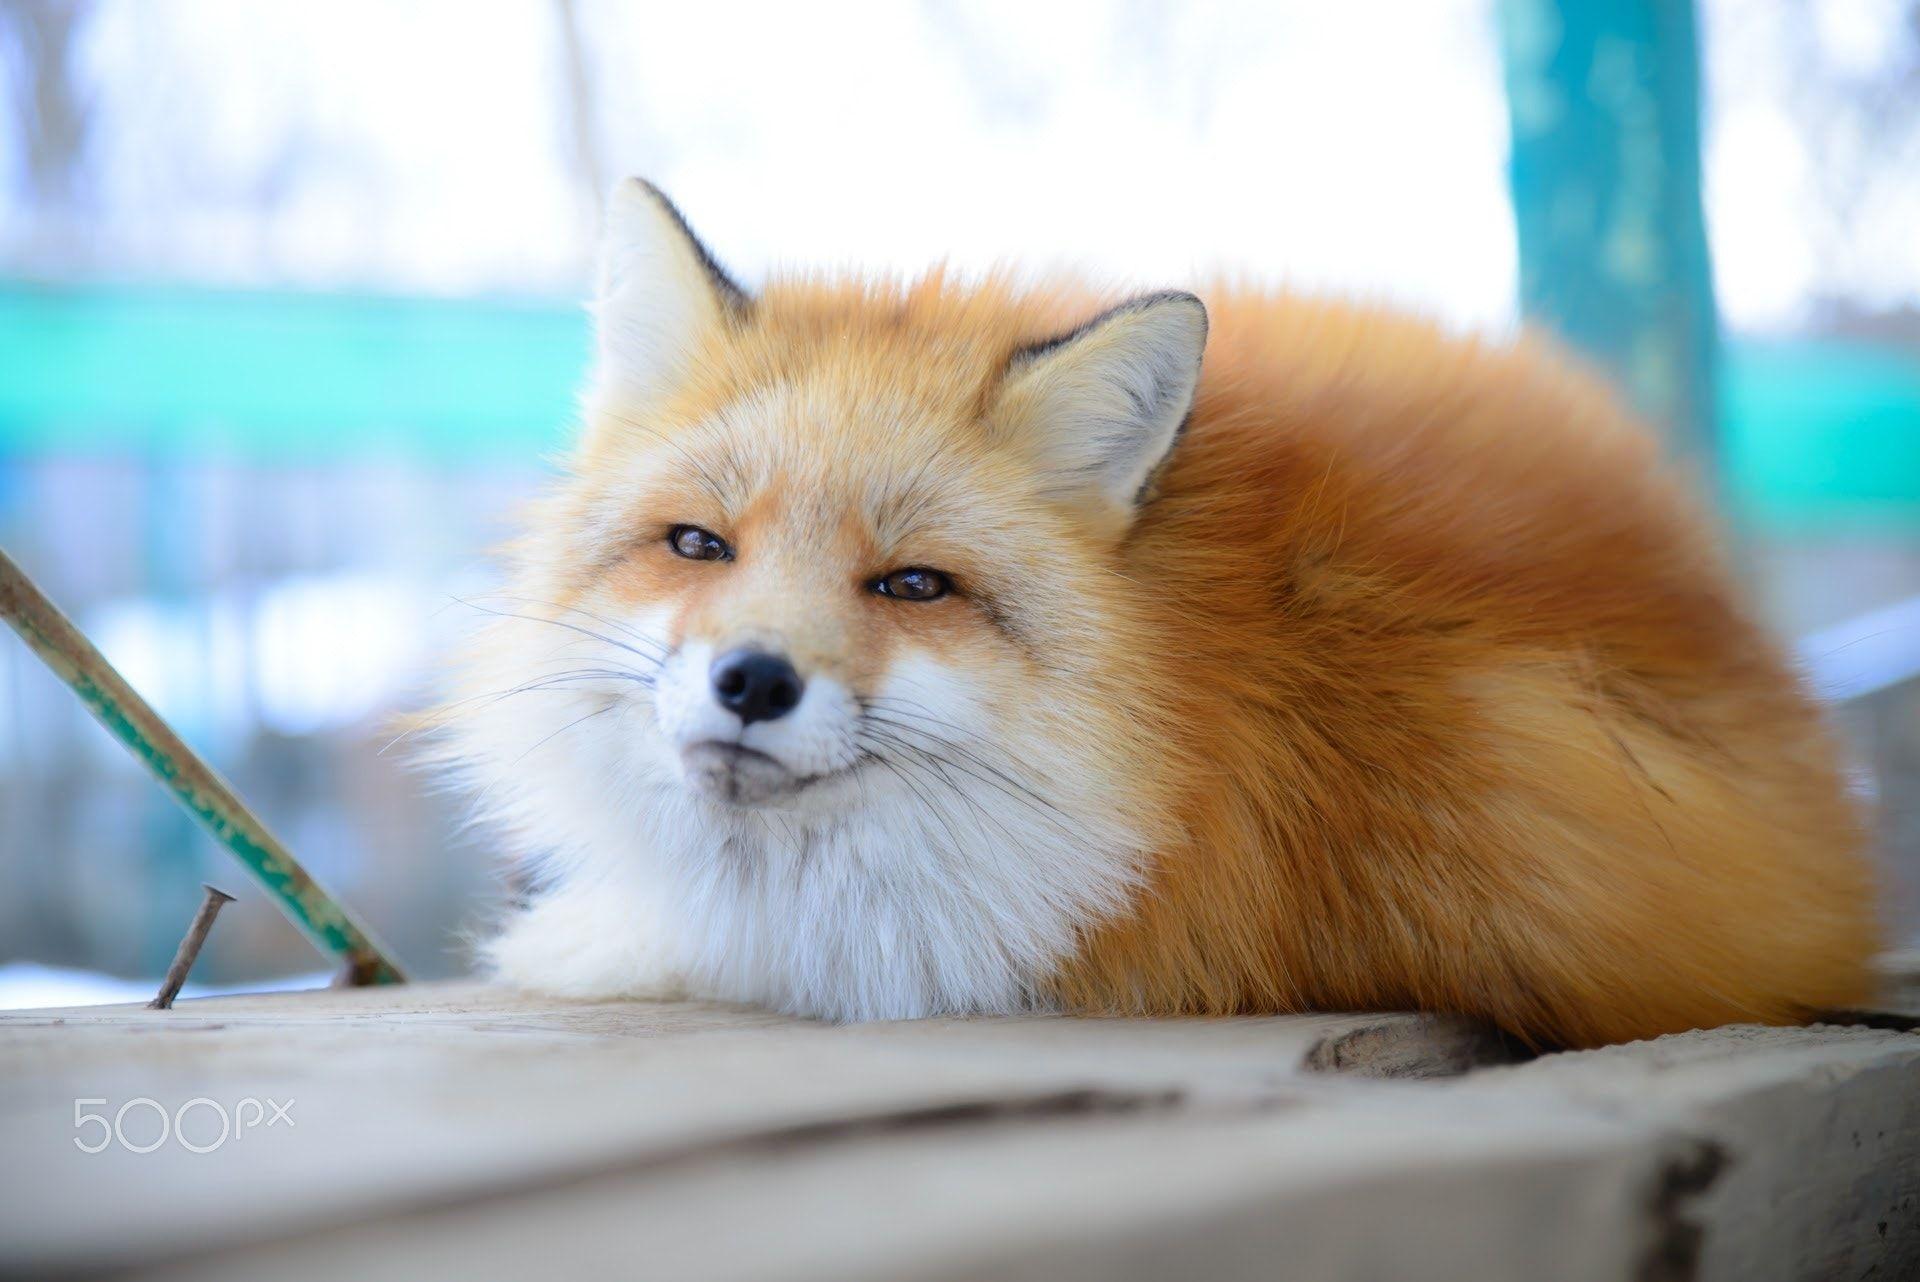 Red Fox by lyca K on 500px